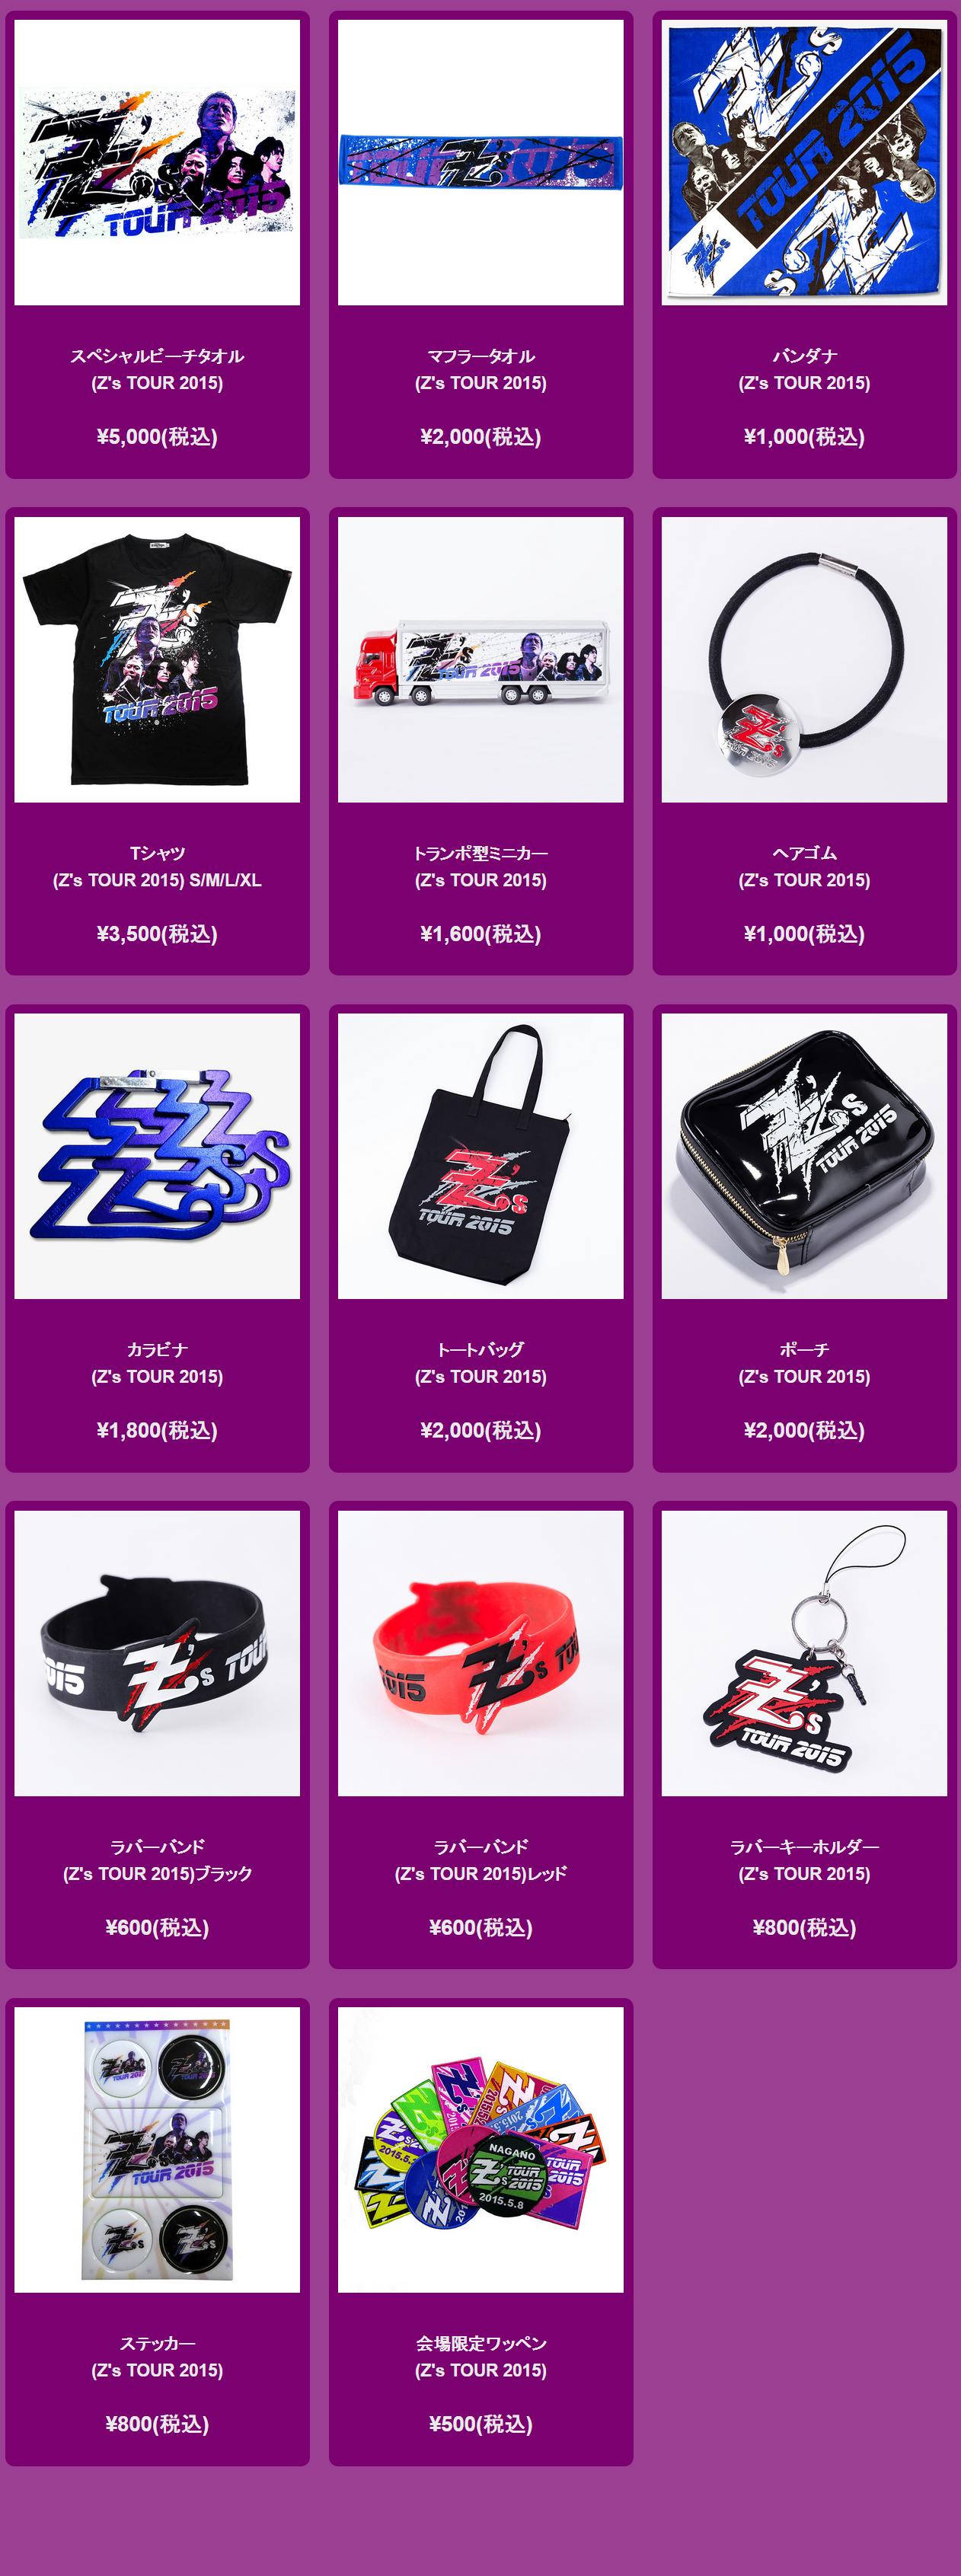 FireShot Capture - Z's TOUR 2015|矢沢永吉 公式サイト - http___www.eikichiyazawa.com_zs2015_